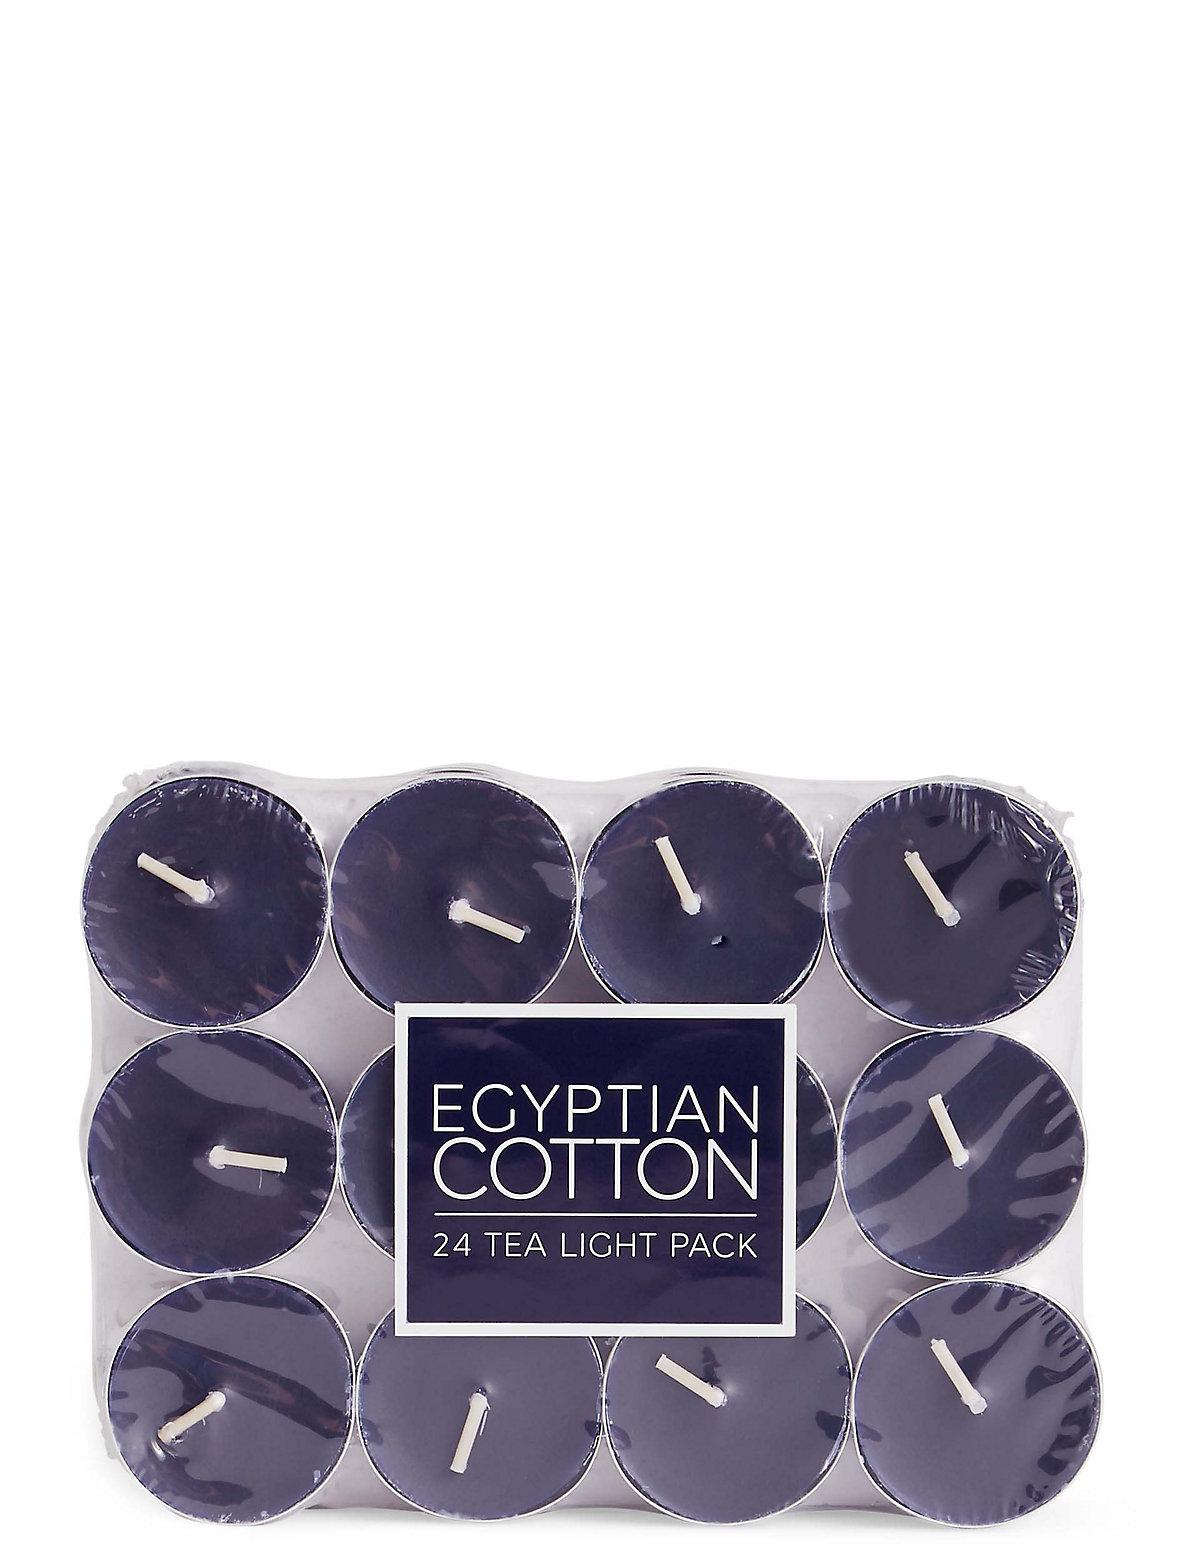 Egyptian Cotton 24 Scented Tea Lights